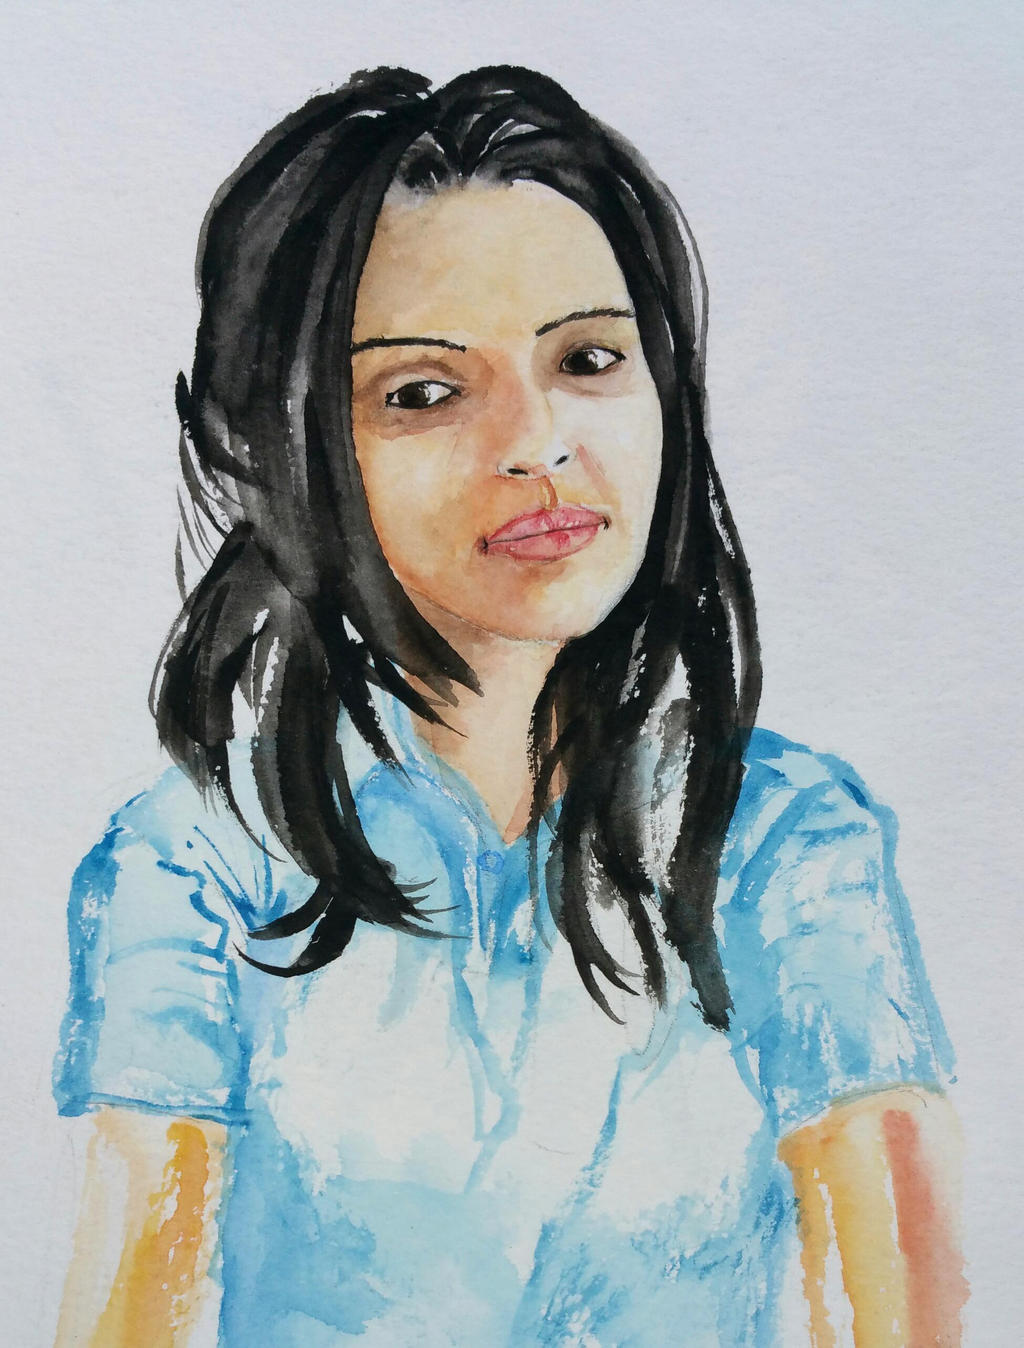 Mrs Jimmy 1 by ColeBarrett